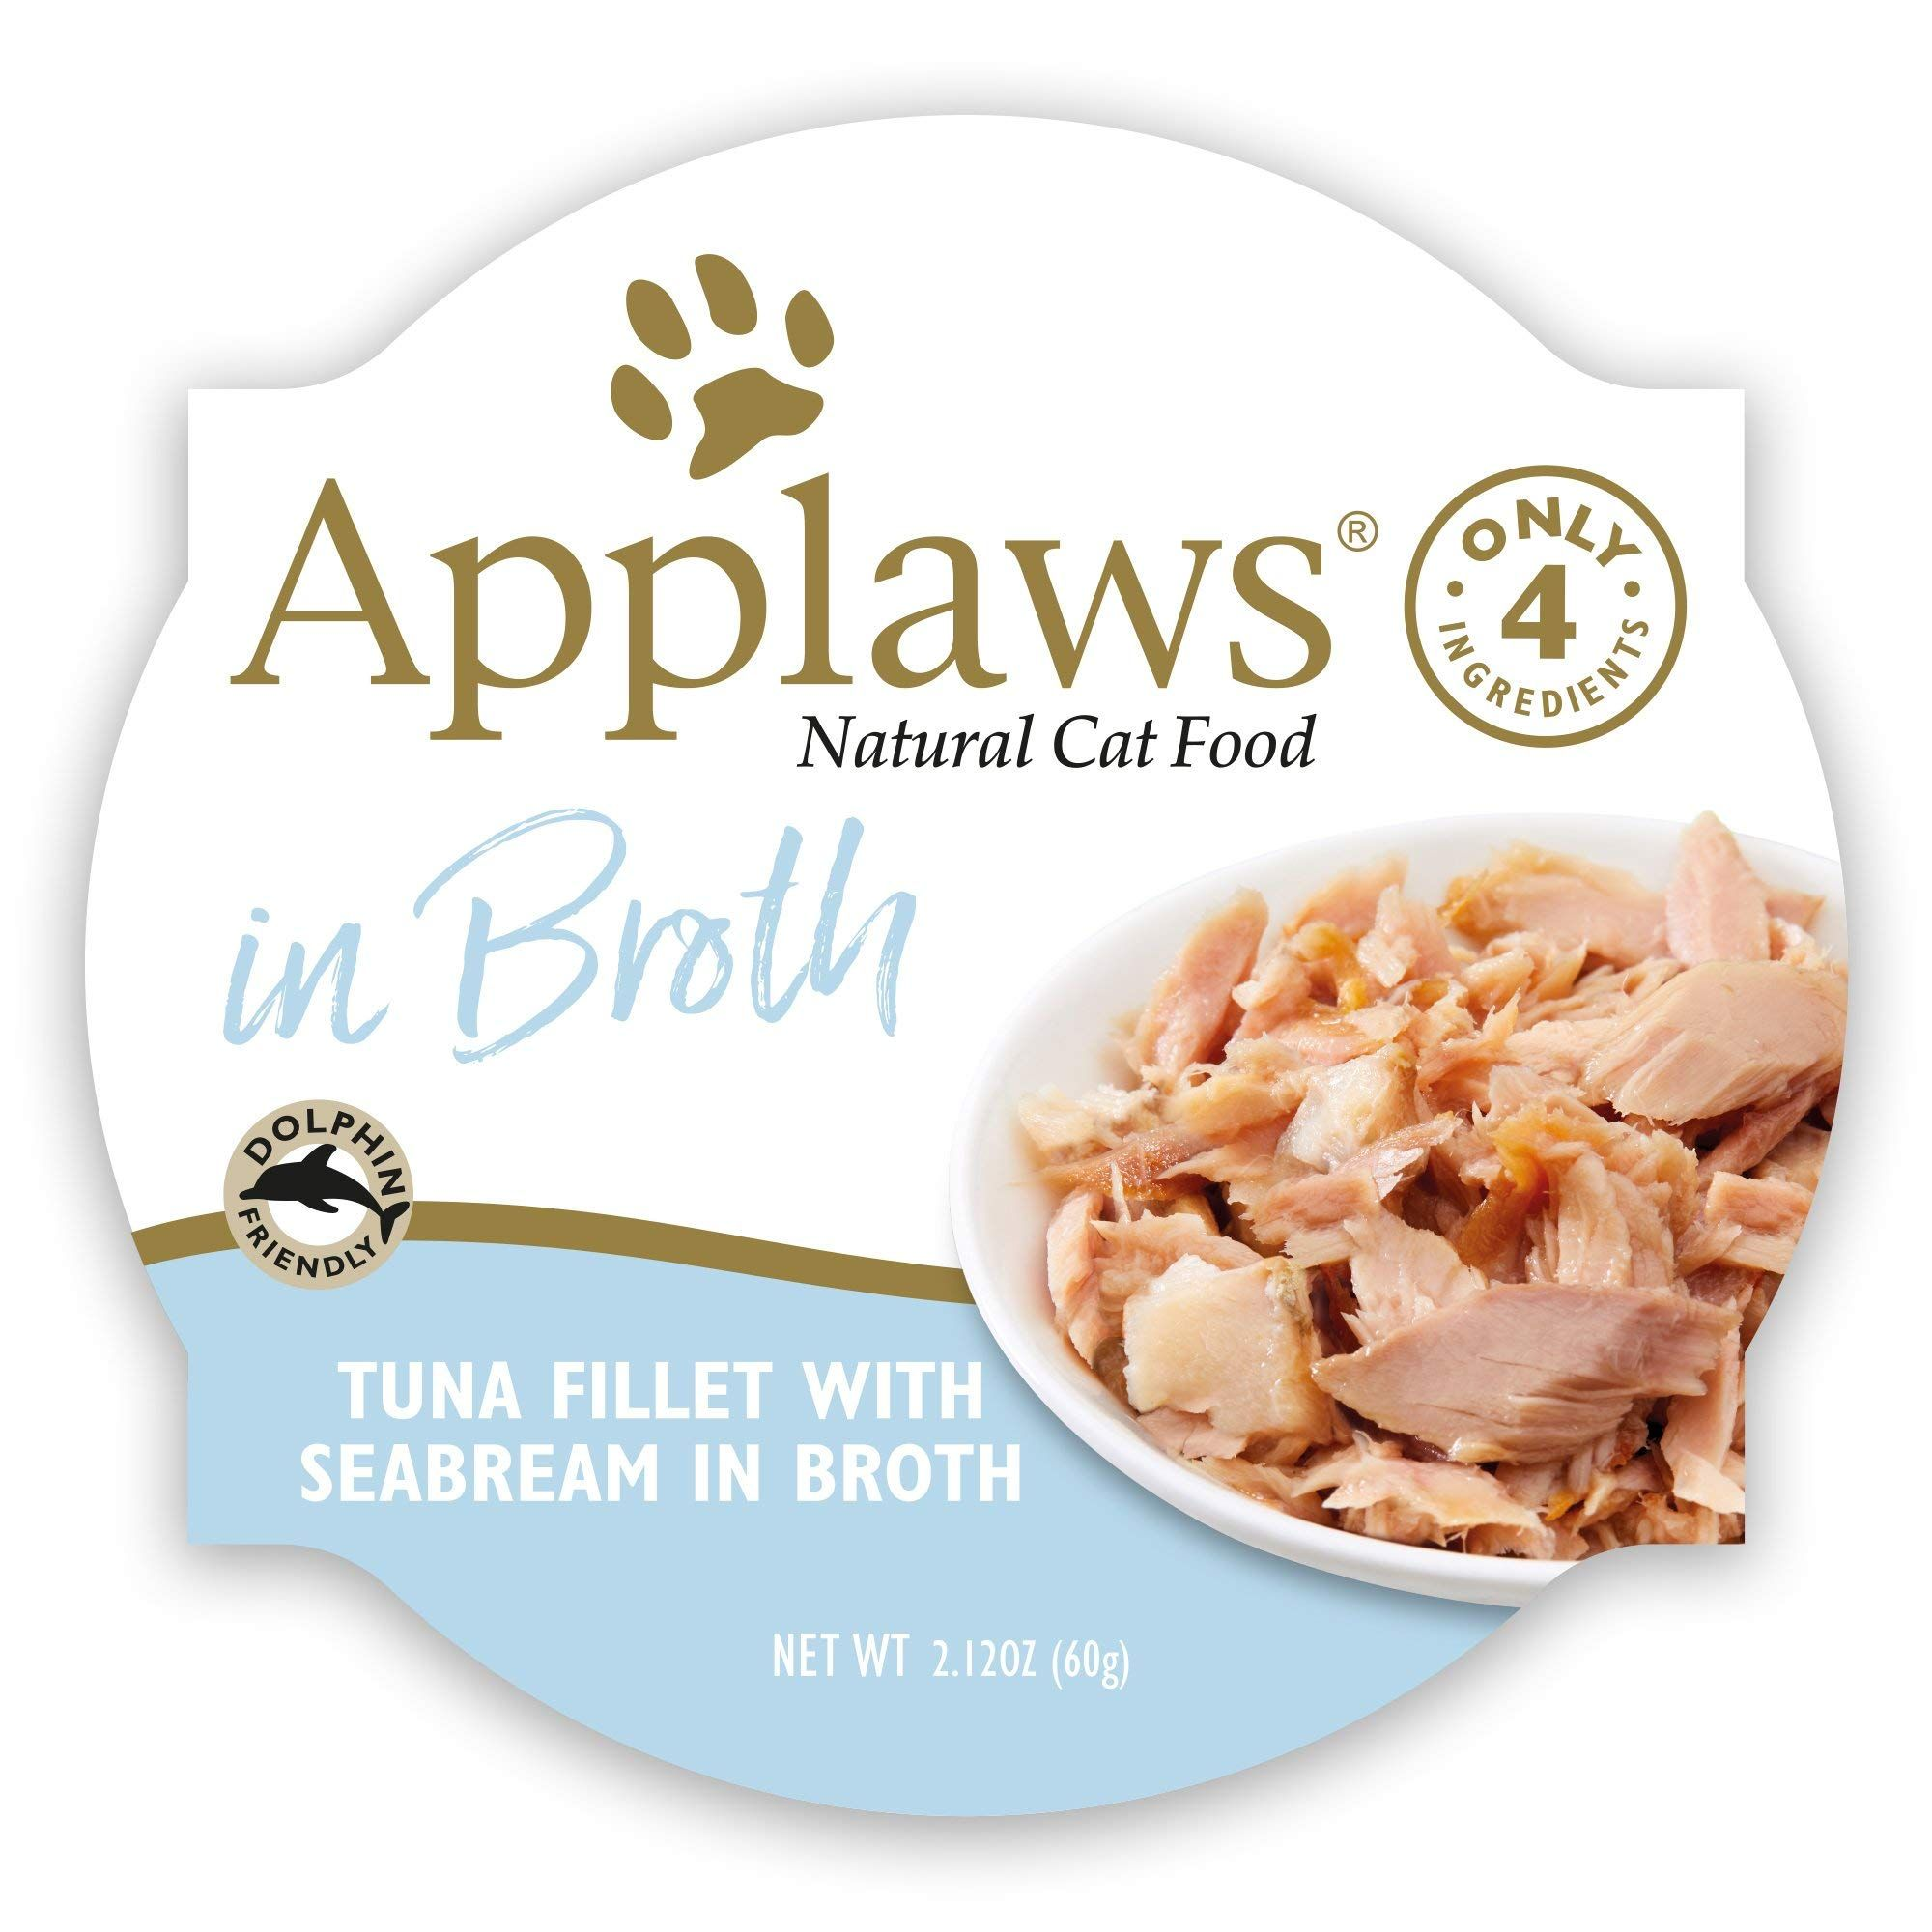 Applaws Fillet Seabream Broth Serve In 2020 Natural Cat Food Wet Cat Food Tuna Fillet